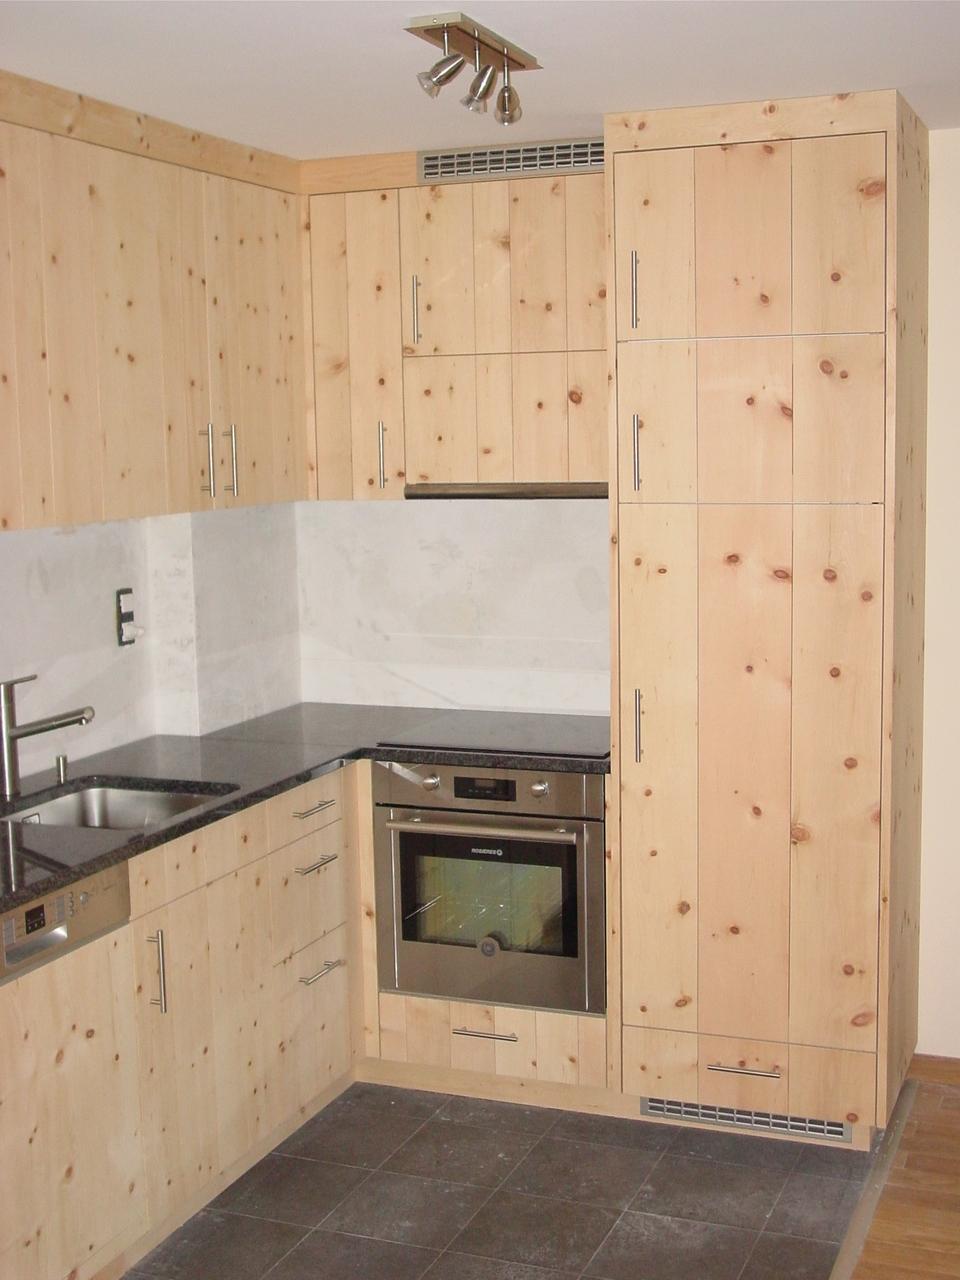 Full Size of Massivholzküchen Henche Massivholzküche Annex Massivholz Küche Modernisieren Massivholzküche Ebay Küche Massivholzküche